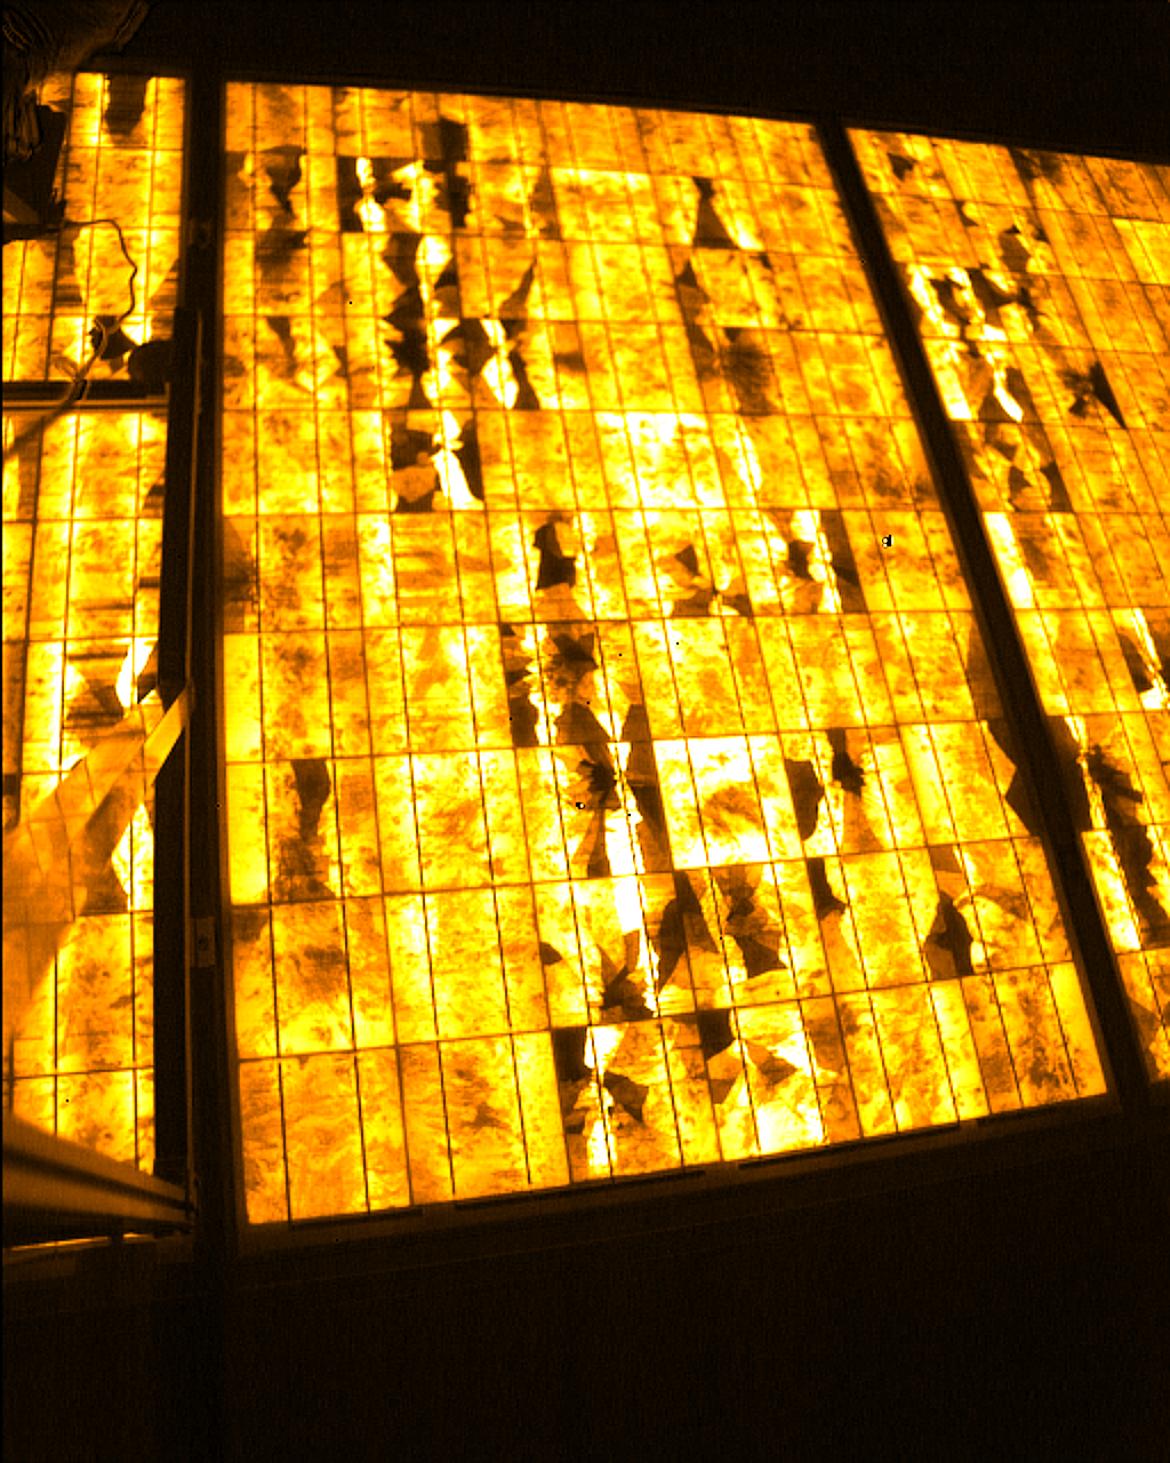 (c) Solarzentrum Stuttgart